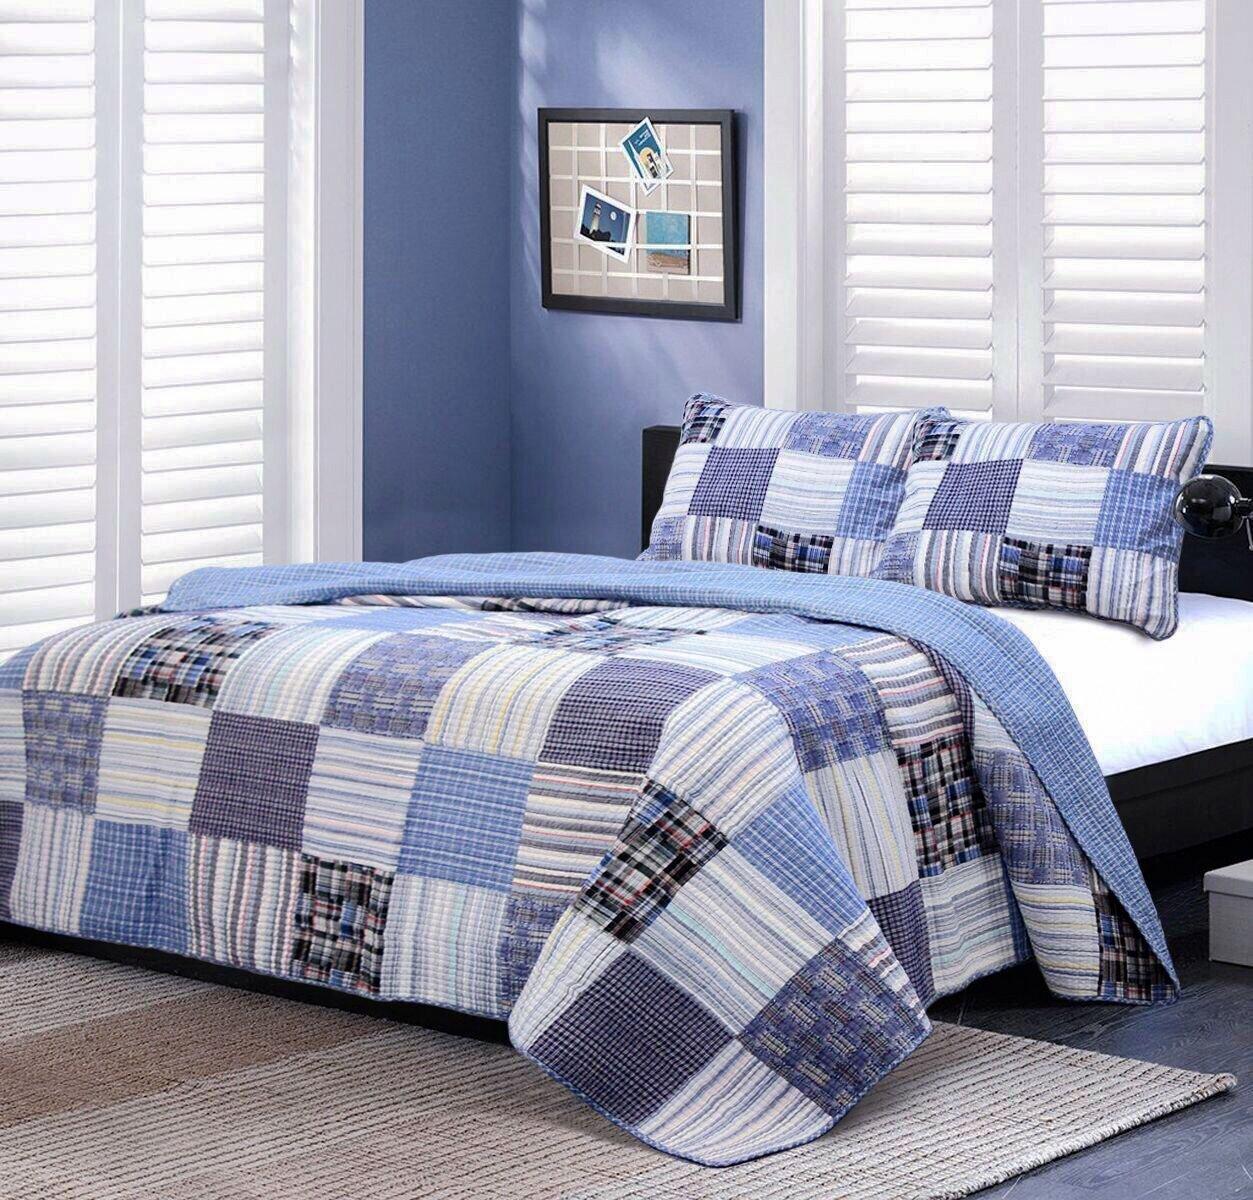 Cozy Line Home Fashions Daniel Denim Navy/Blue/White/Black Plaid Striped Patchwork Cotton Quilt Bedding Set, Reversible Coverlet,Bedspread Gifts for Boy/Men/Him (Denim Patchwork, Queen -3 piece)